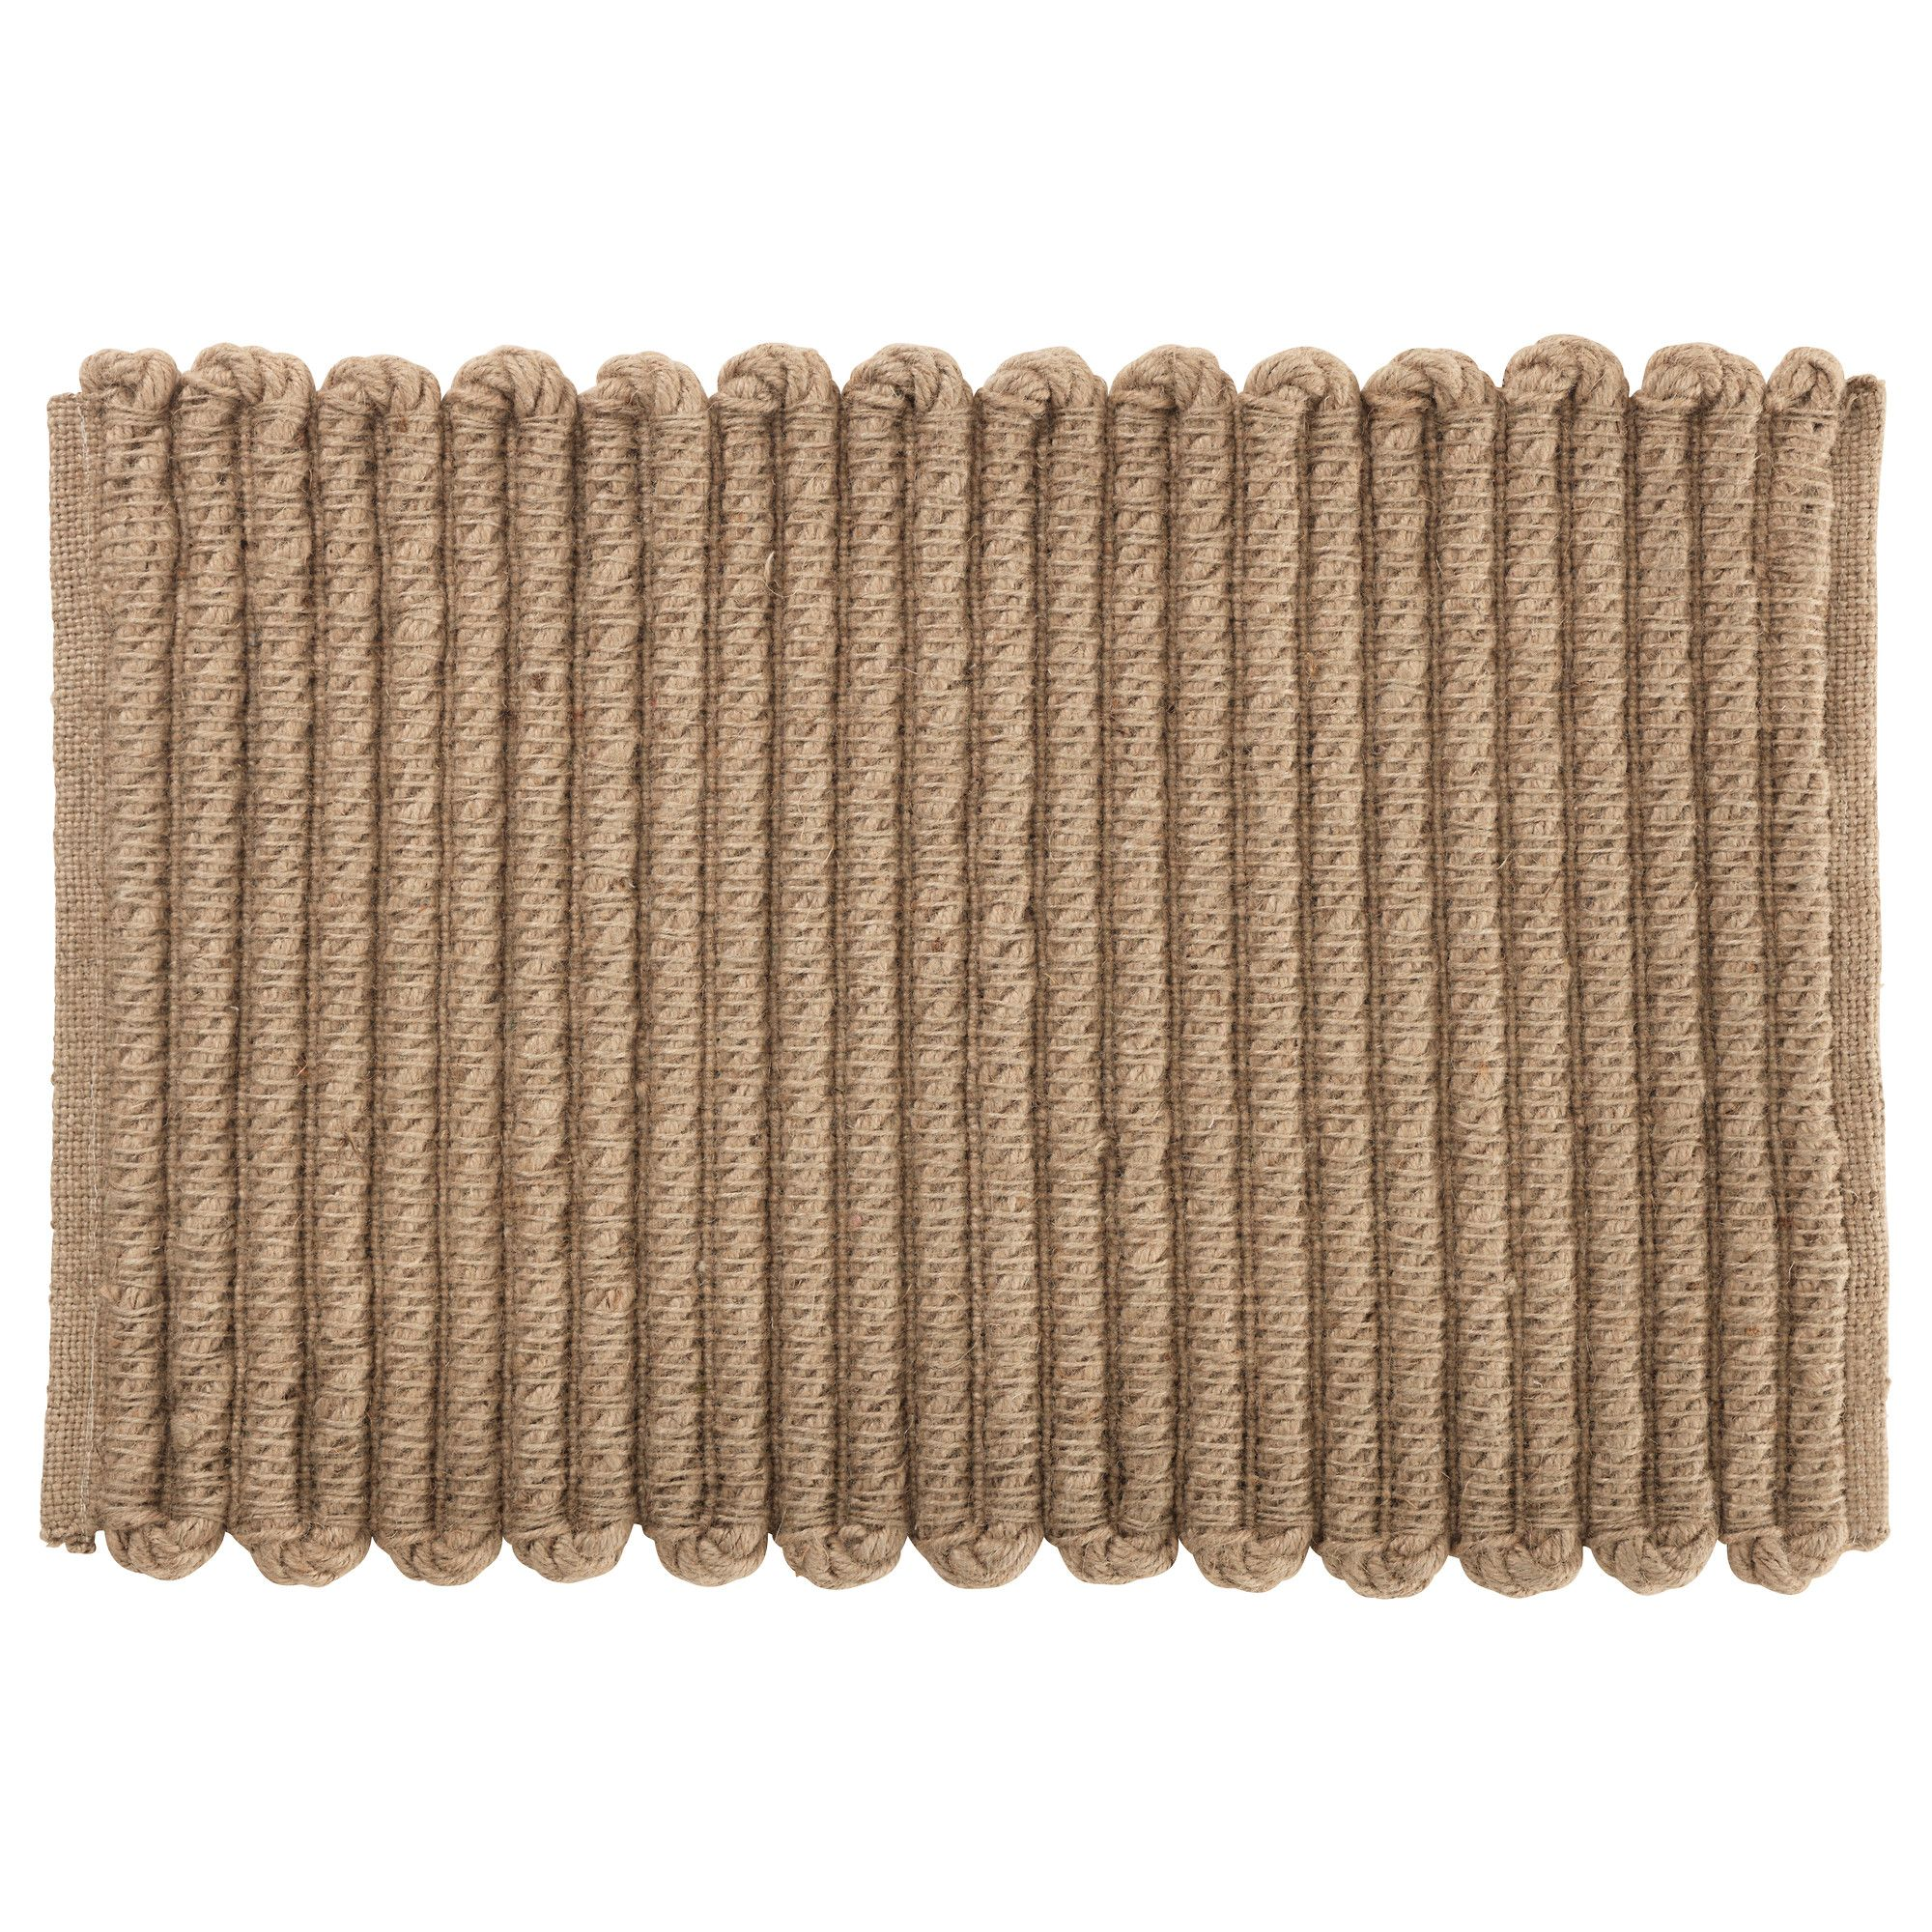 LISEL Door mat IKEA $10 Kitties would LOVE scratching this I